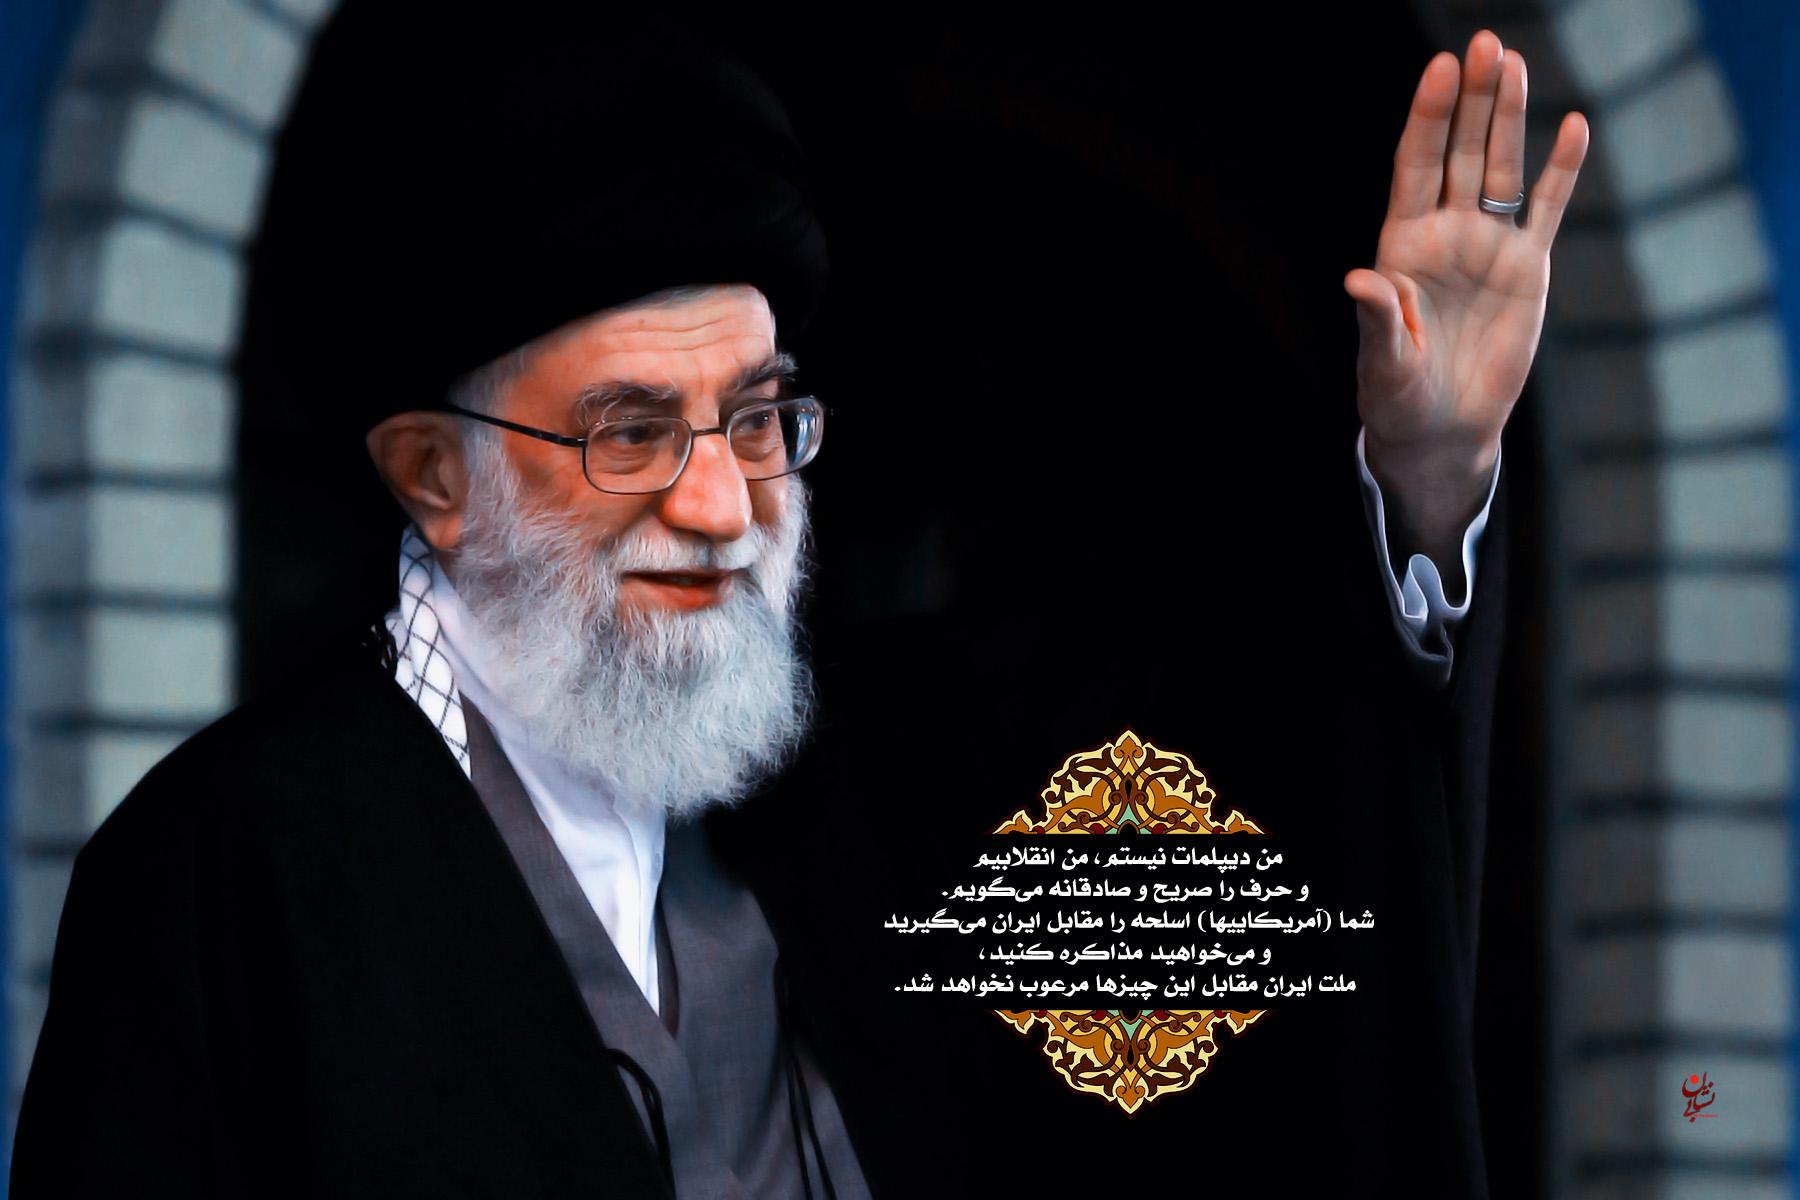 http://bi-neshan.ir/wp-content/uploads/2013/02/Seyed-Ali-52.jpg